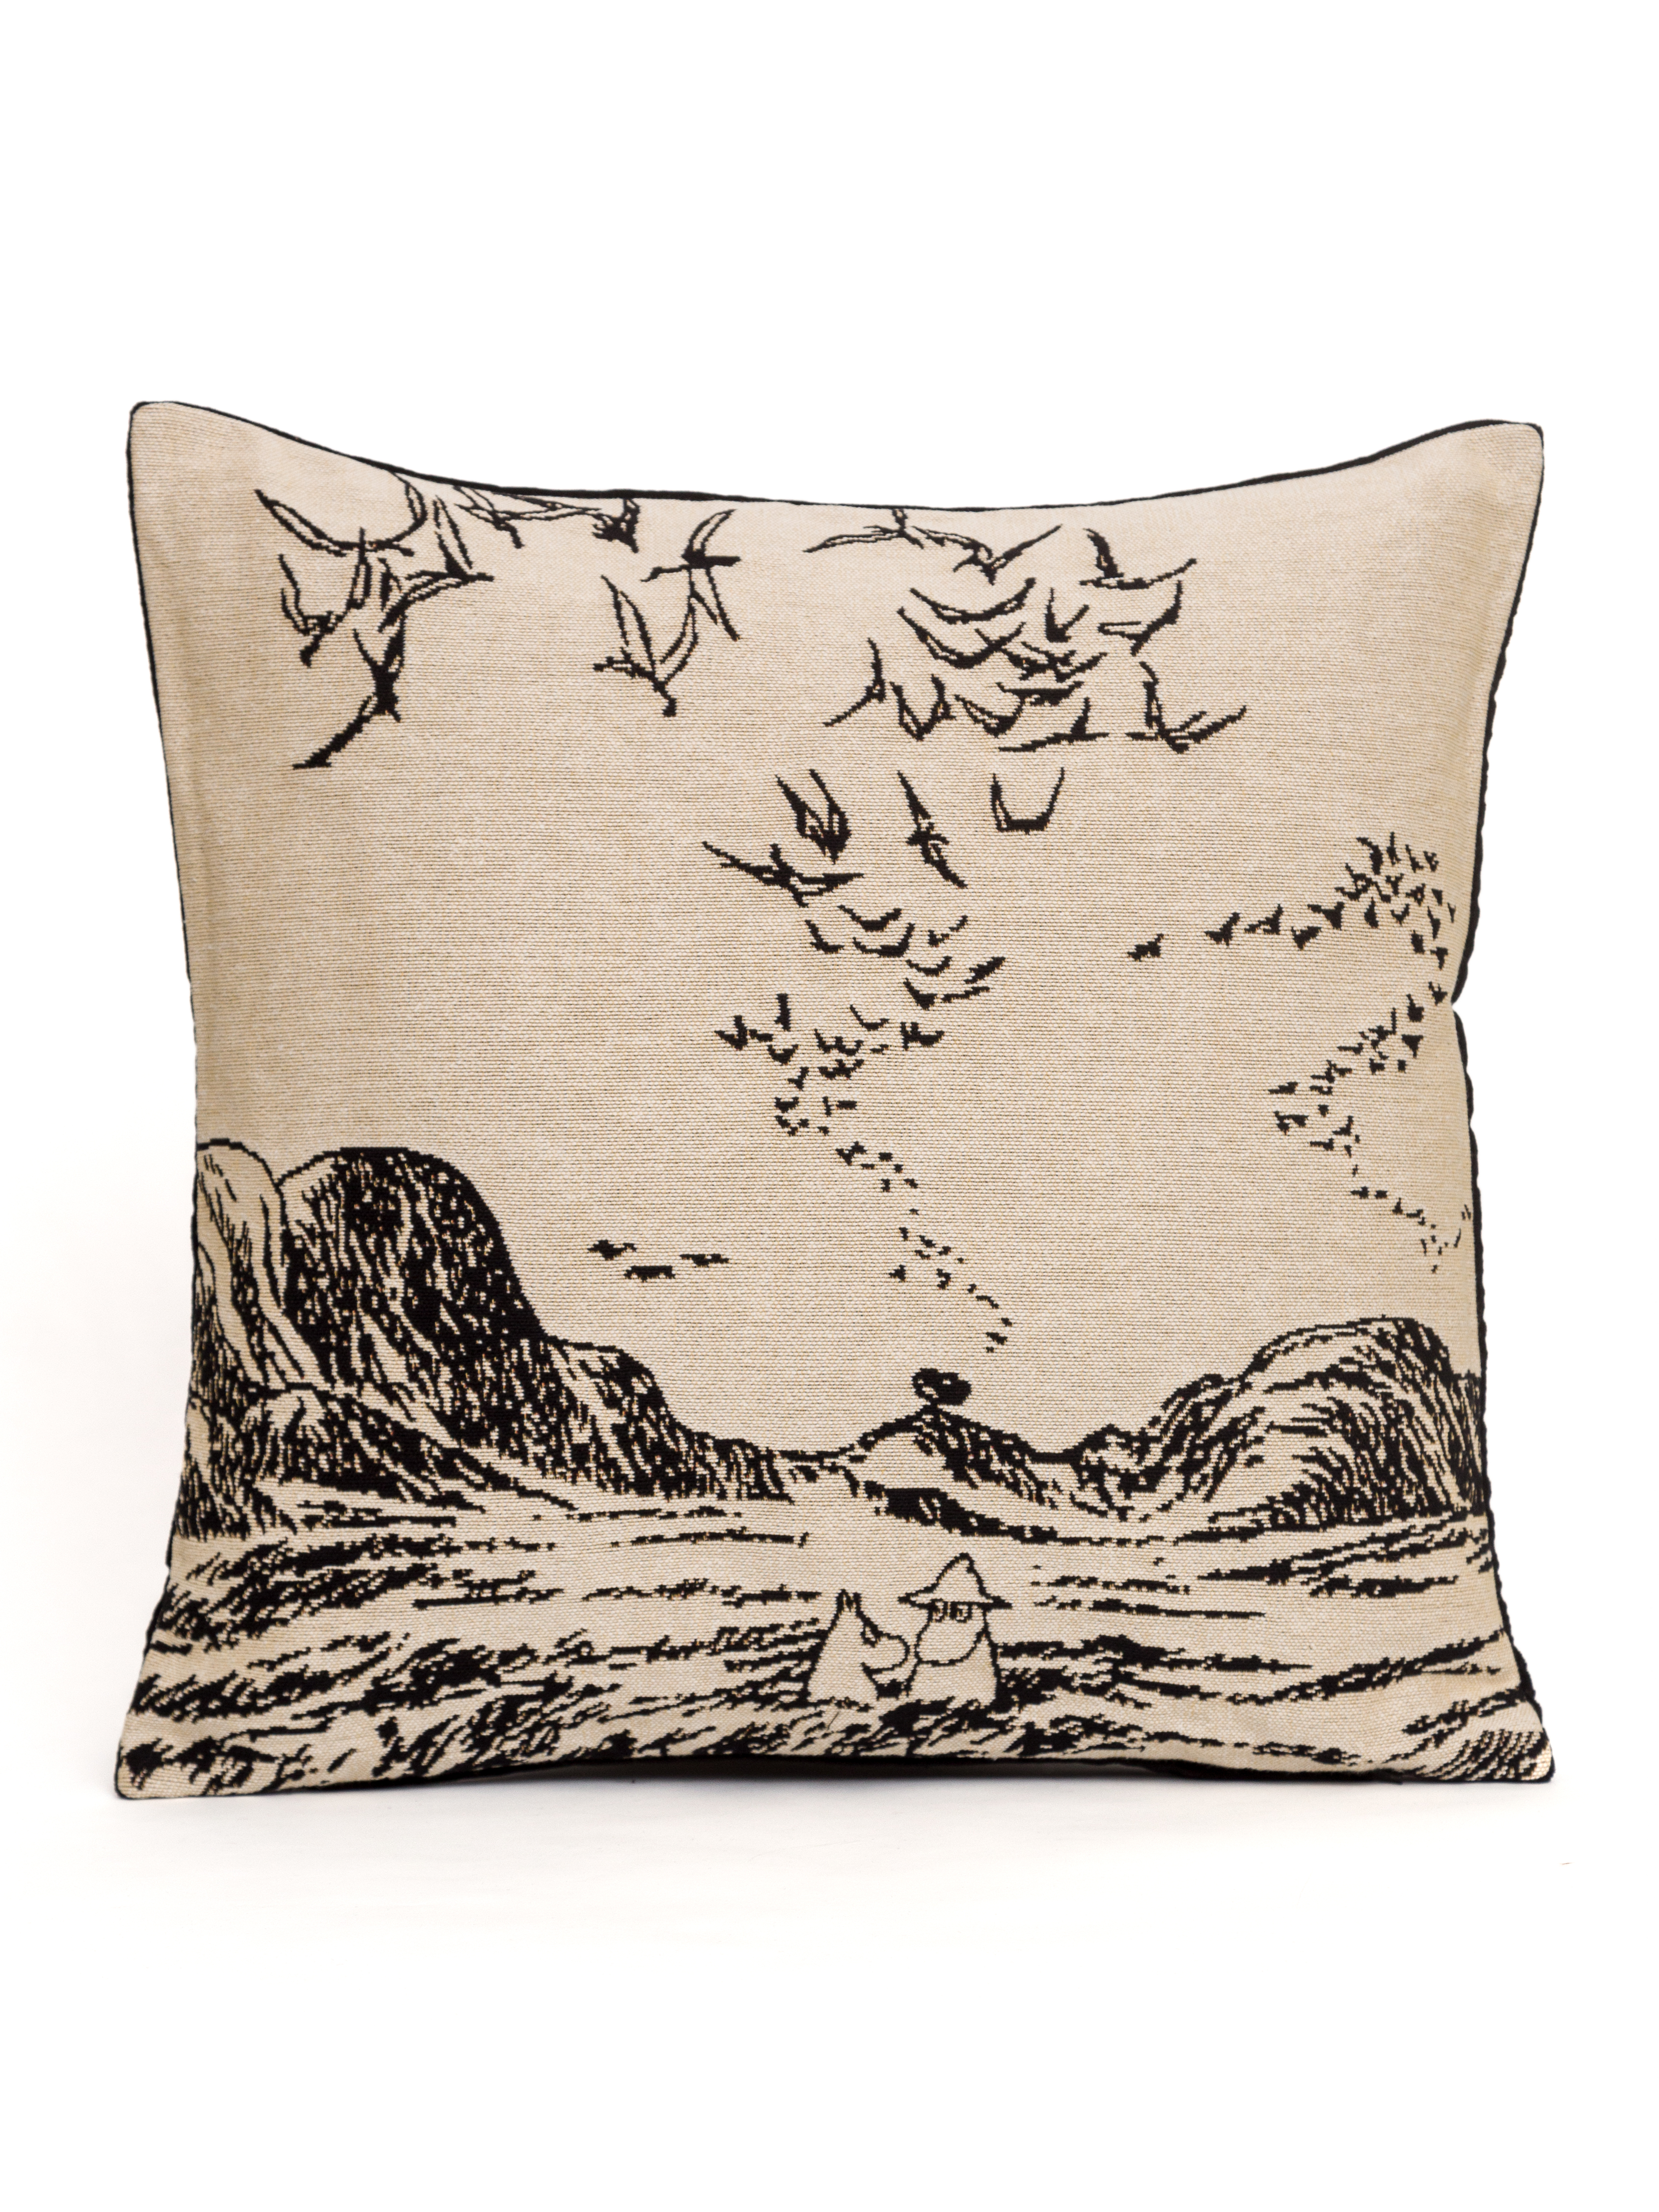 Aurora Decorari Moomin Gobelin Cushion Cover 014CHMoomins in Sea